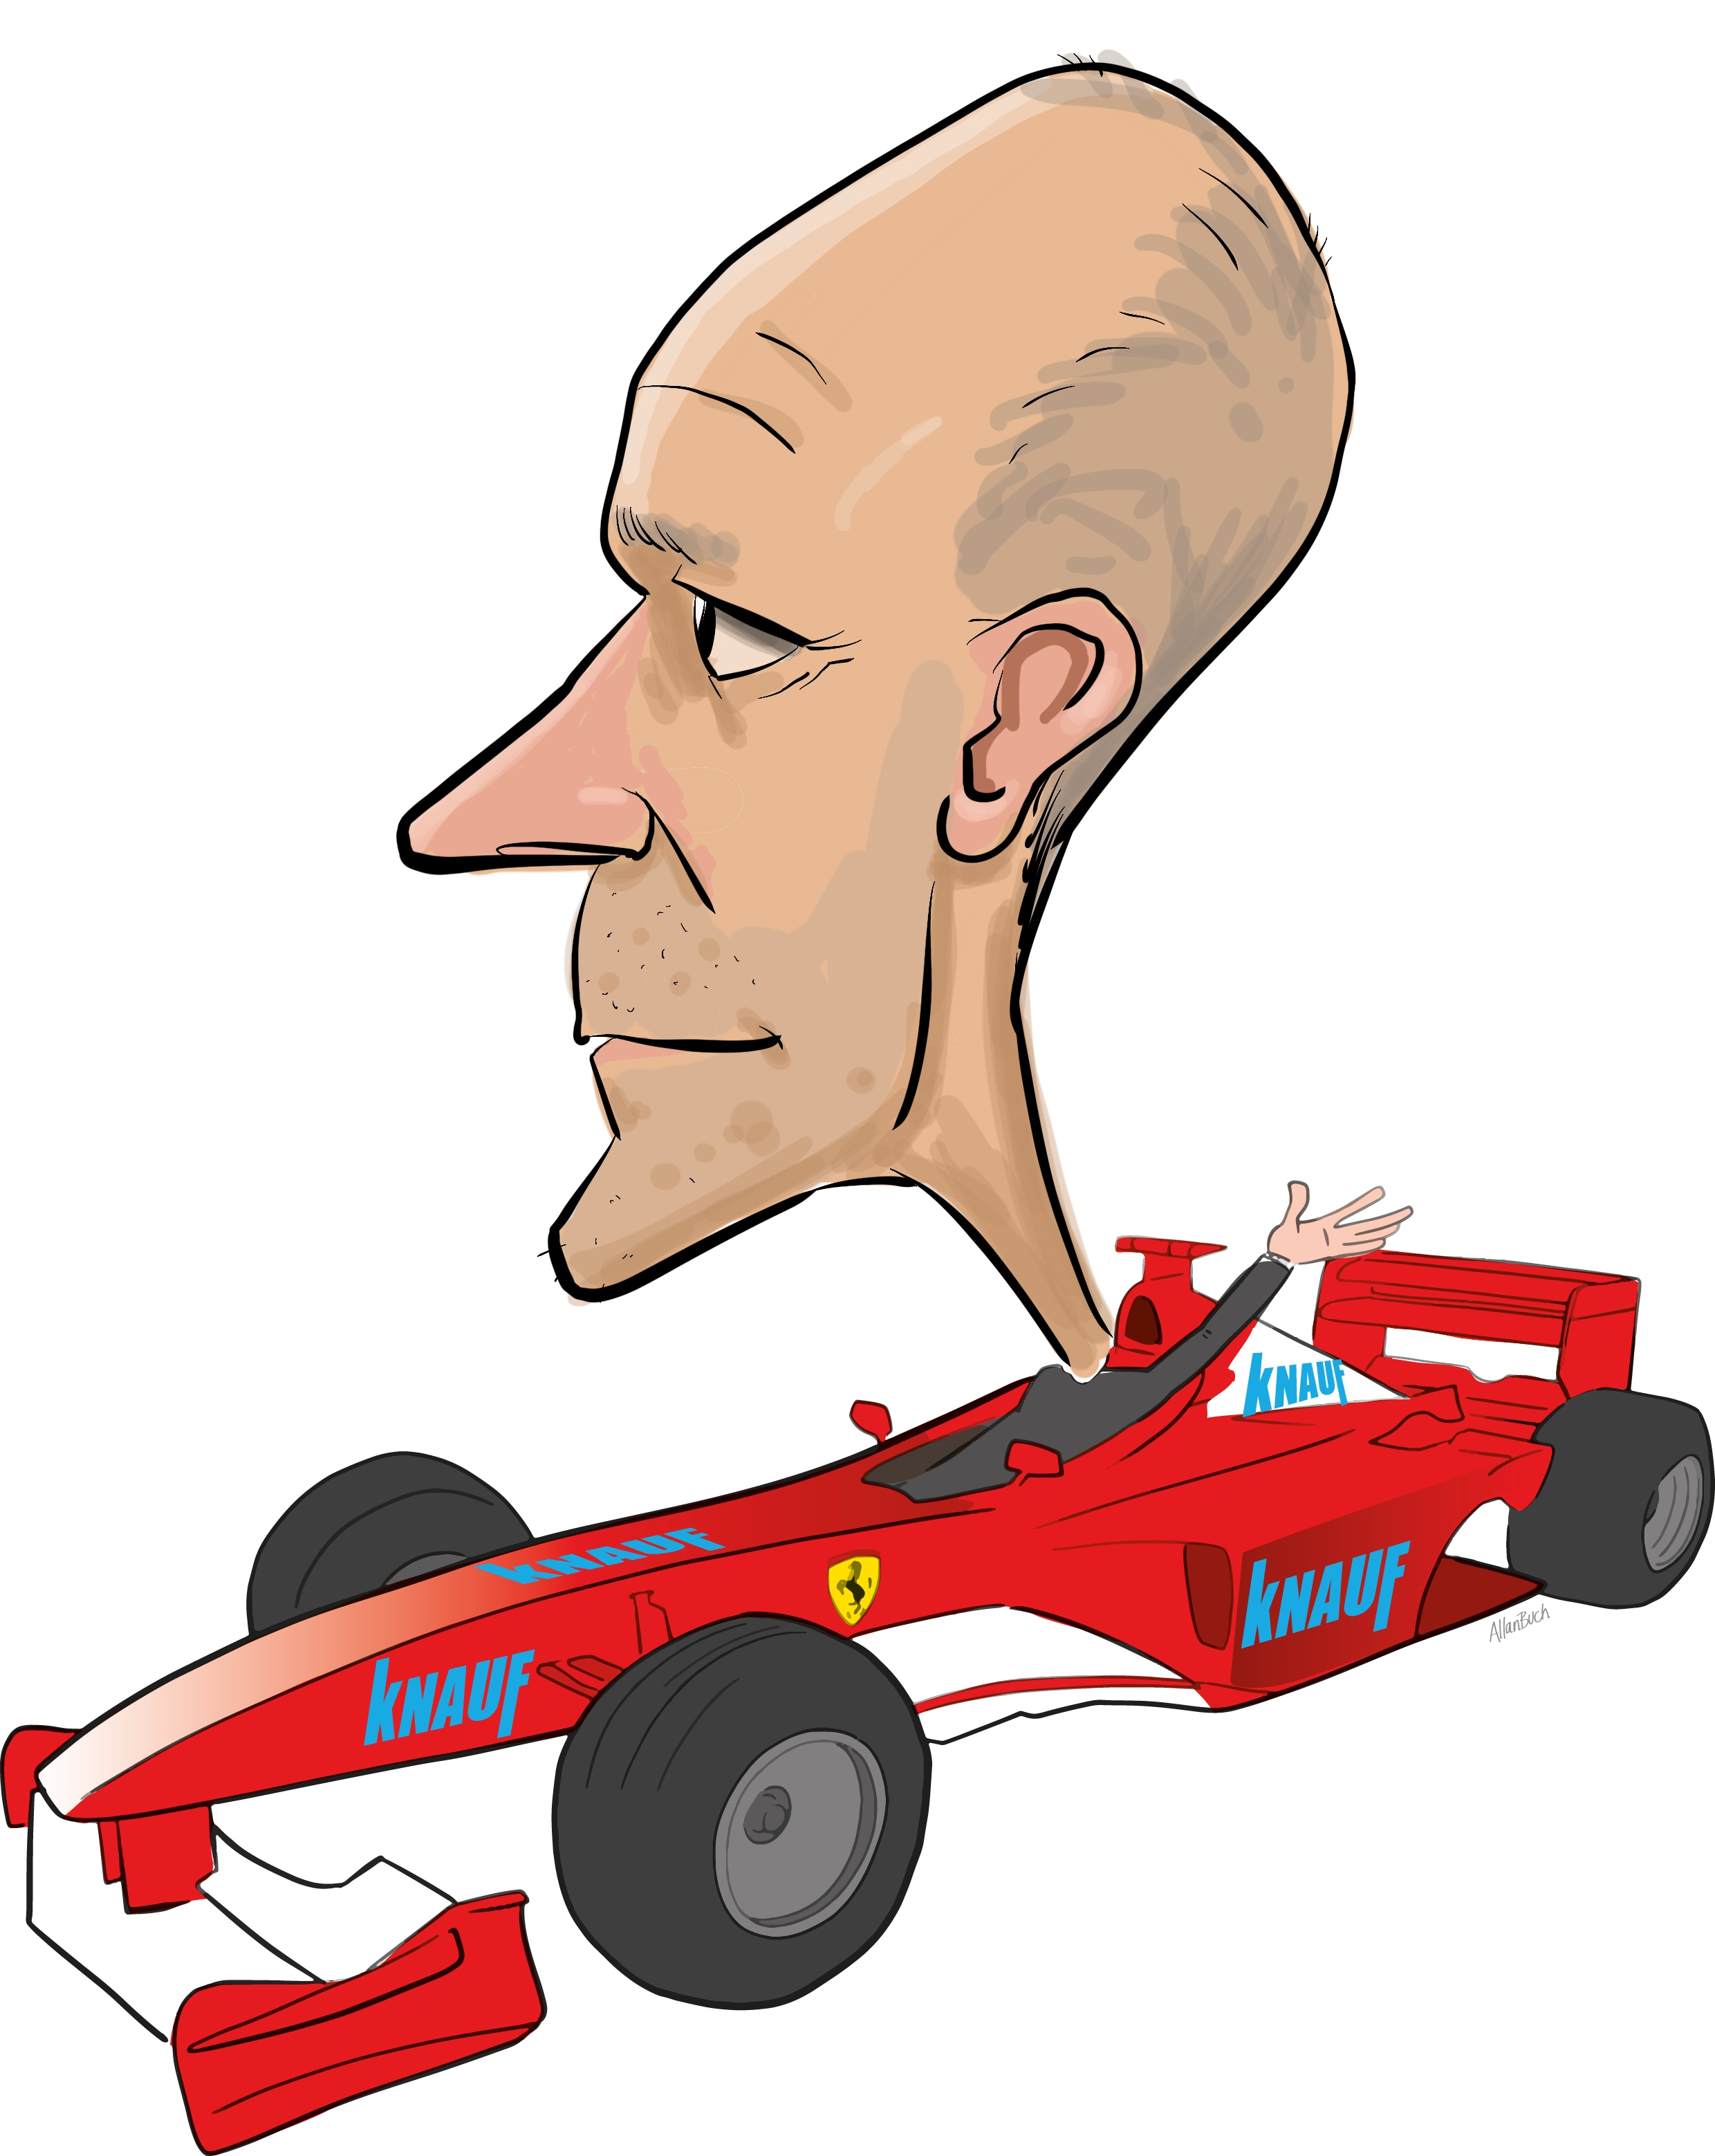 ipad Live karikatur med Allan Buch. farve profiltegning19